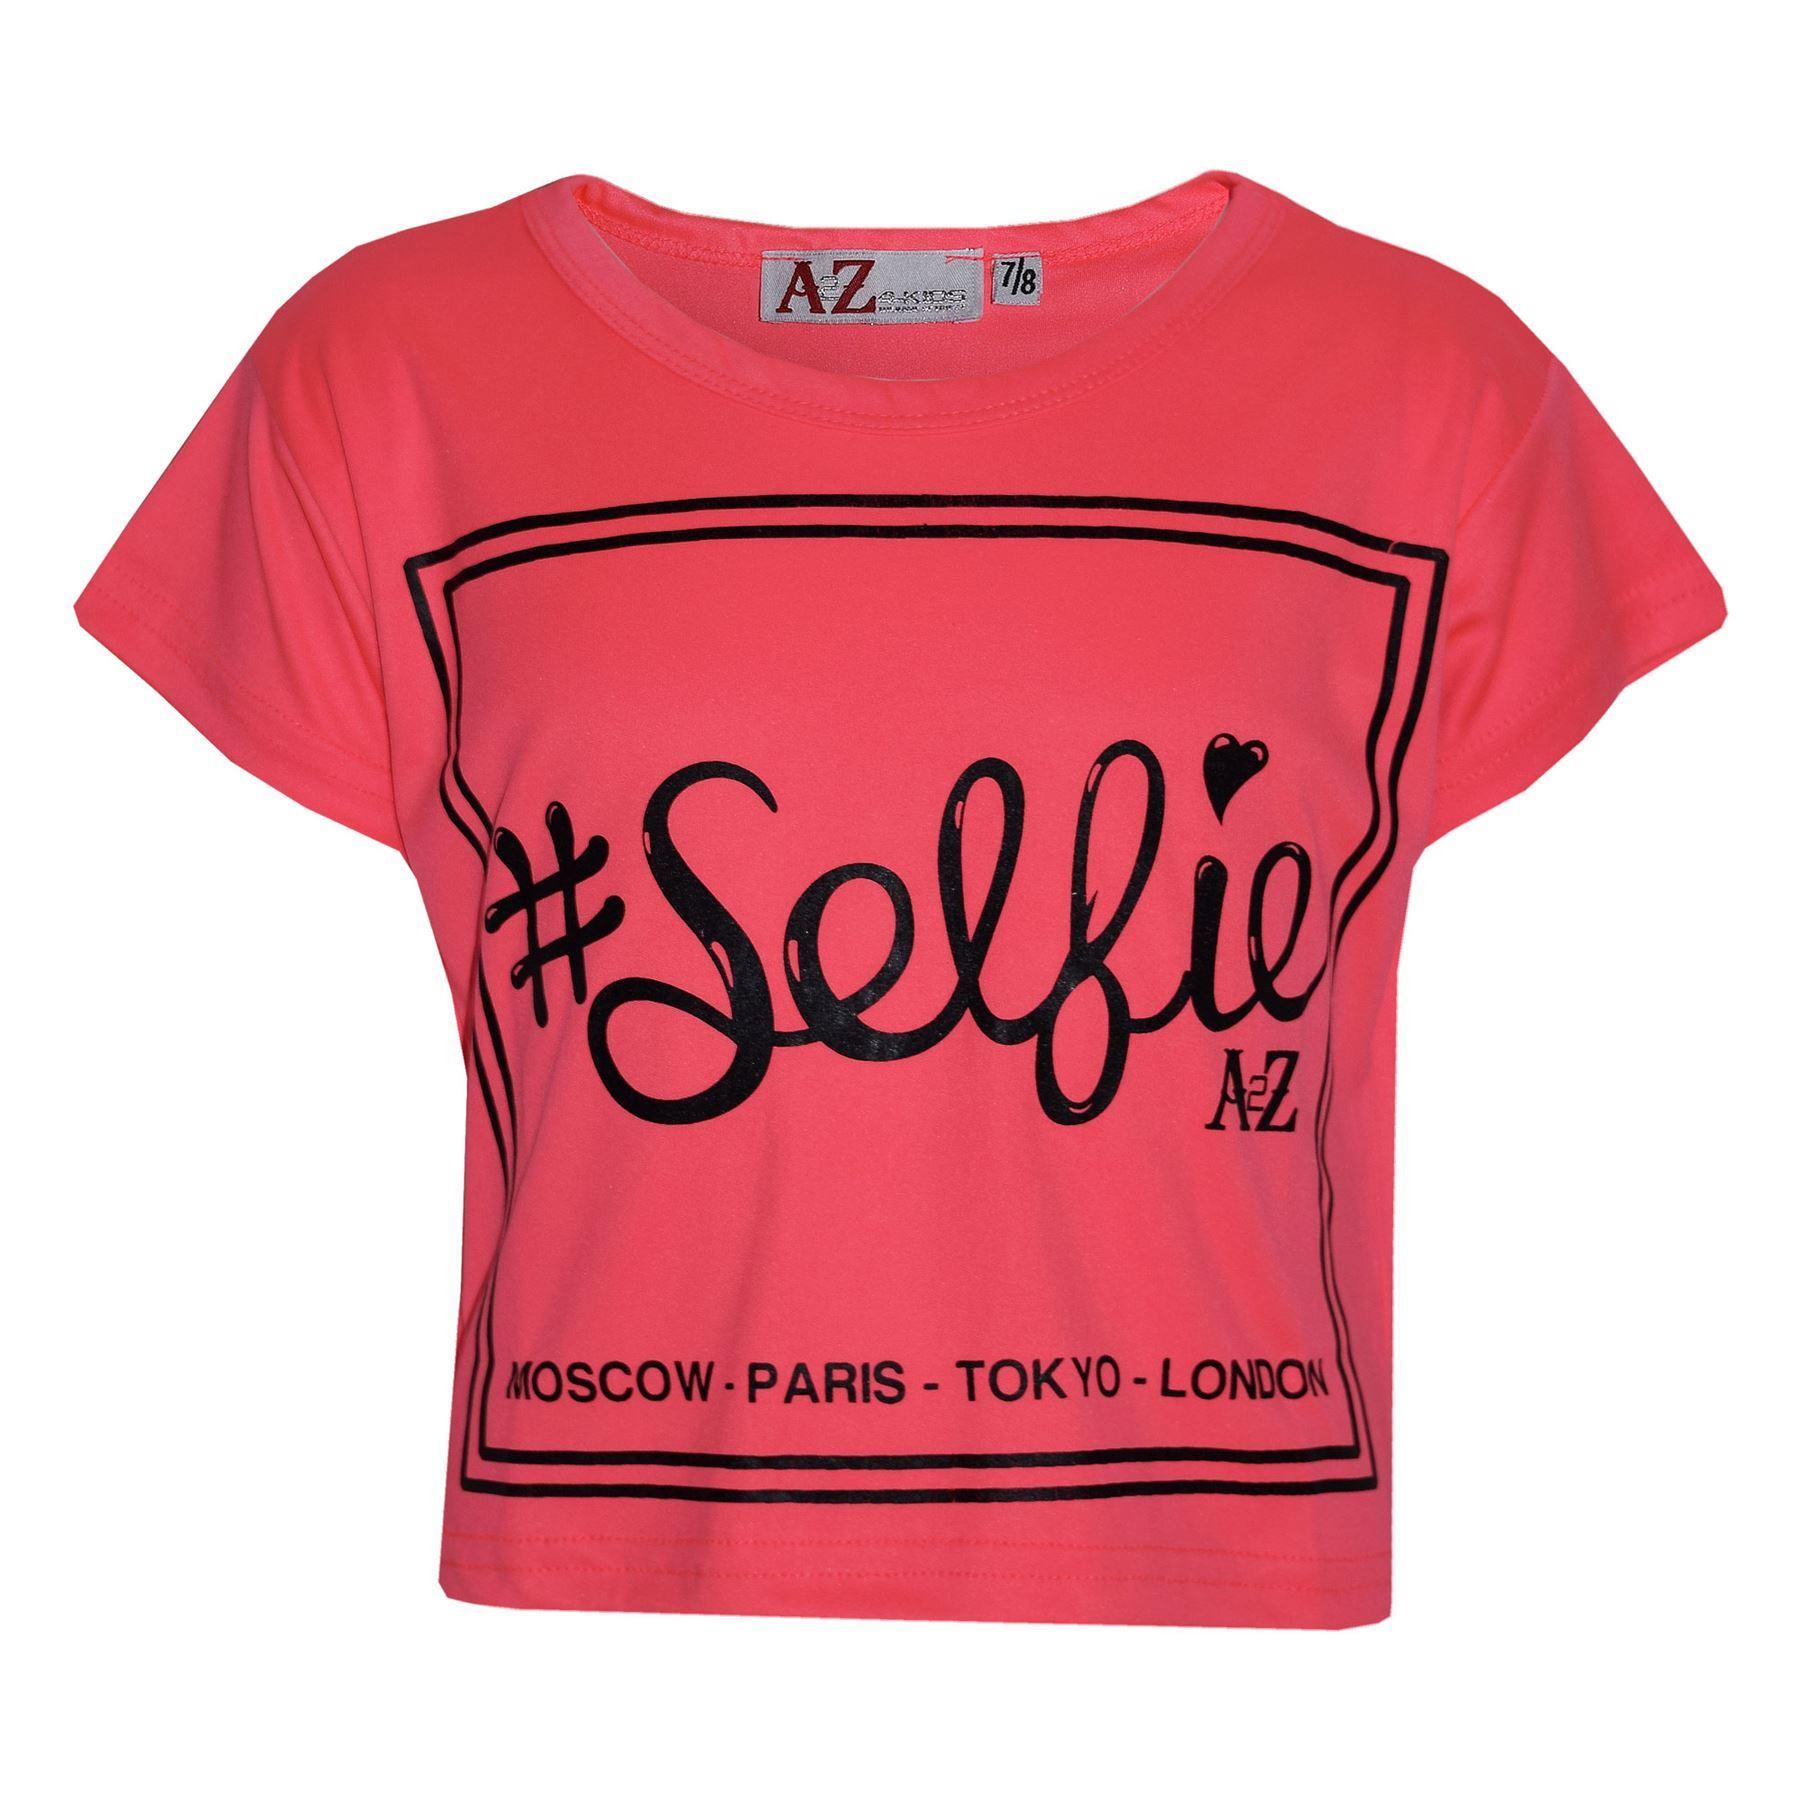 Girls Top #Selfie Print Stylish Fahsion Trendy T Shirt Top New Age 7-13 Years